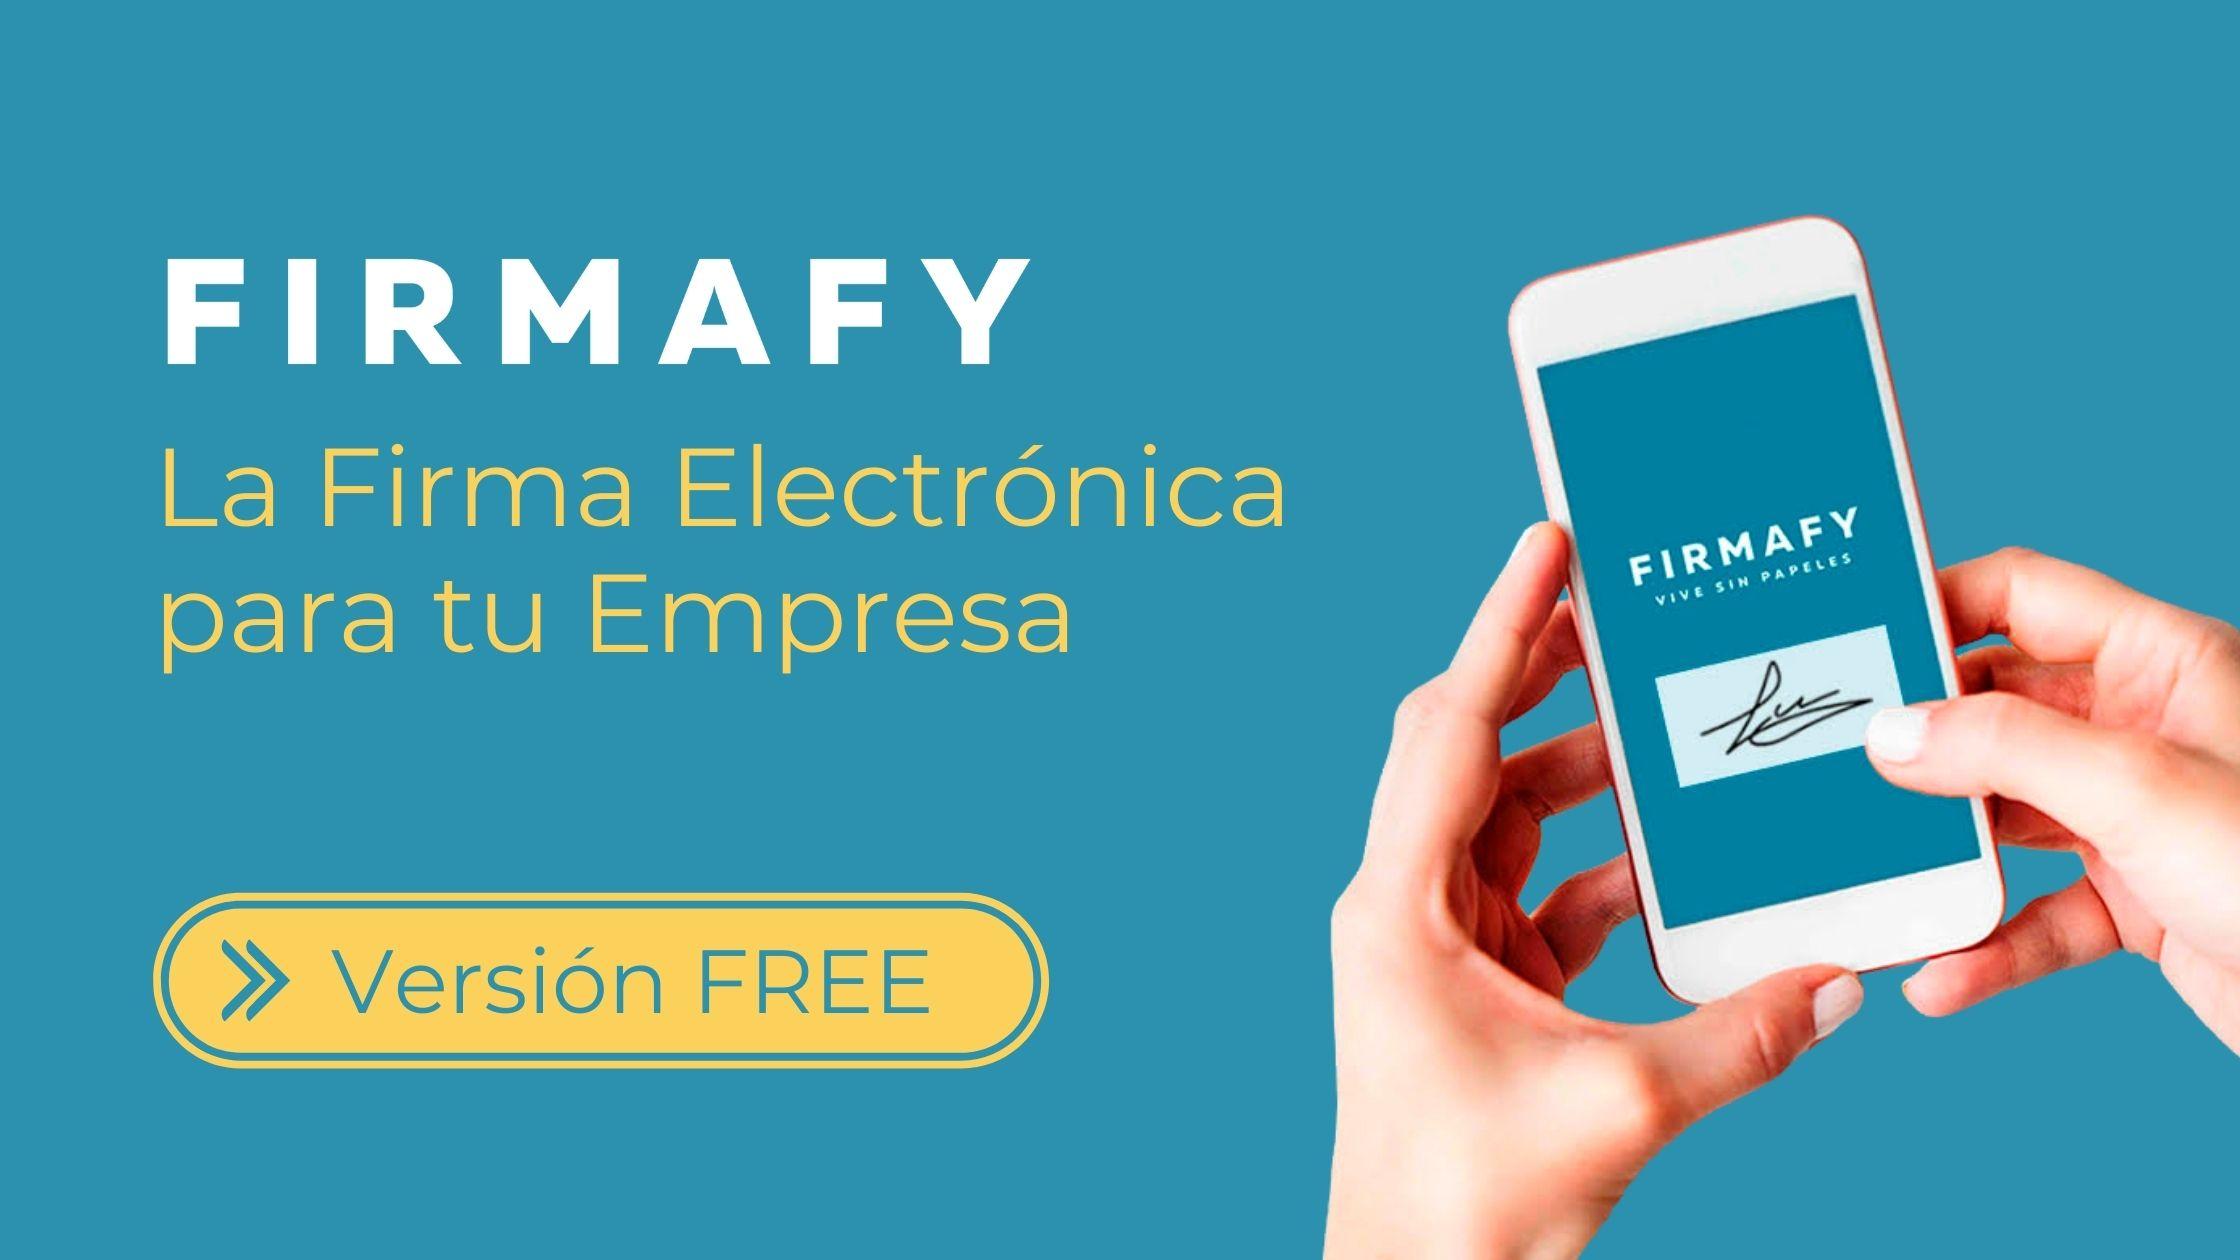 Firmafy. Firma electrónica para tu empresa